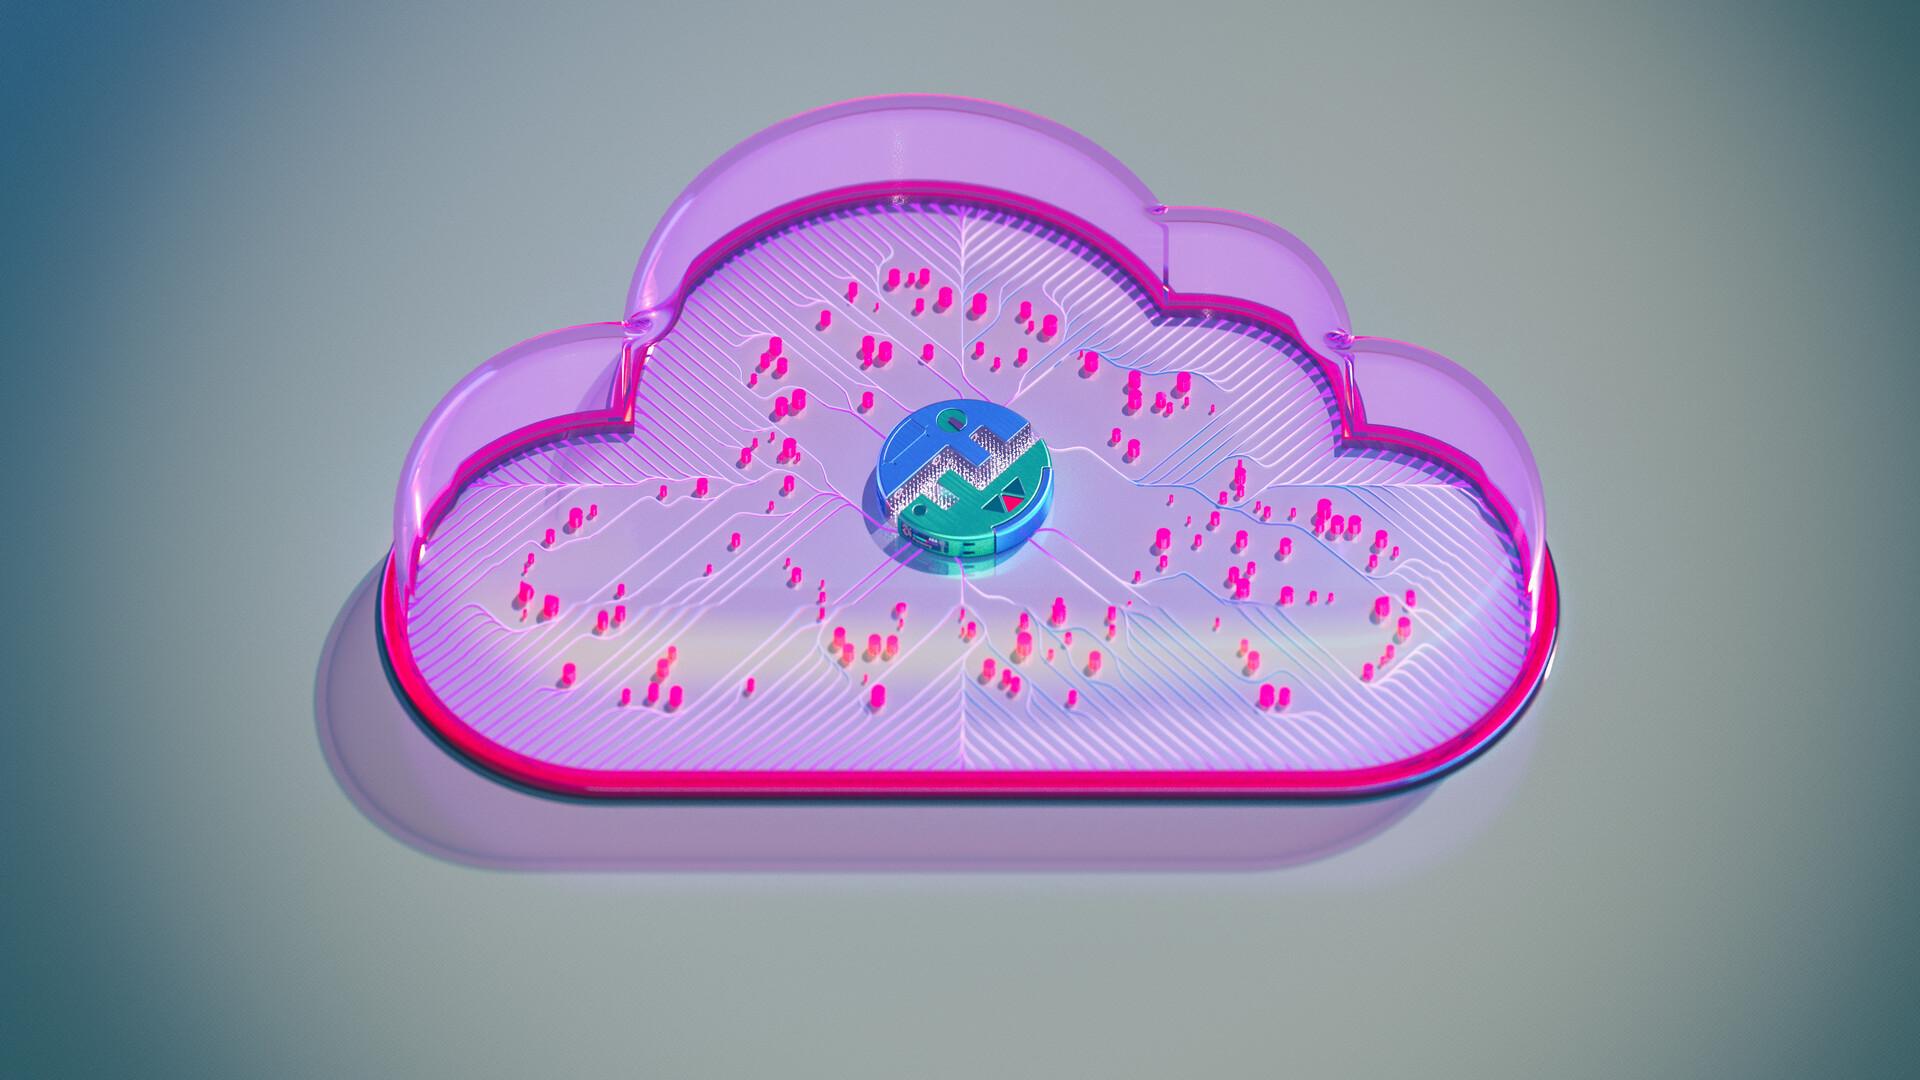 FZ cloud